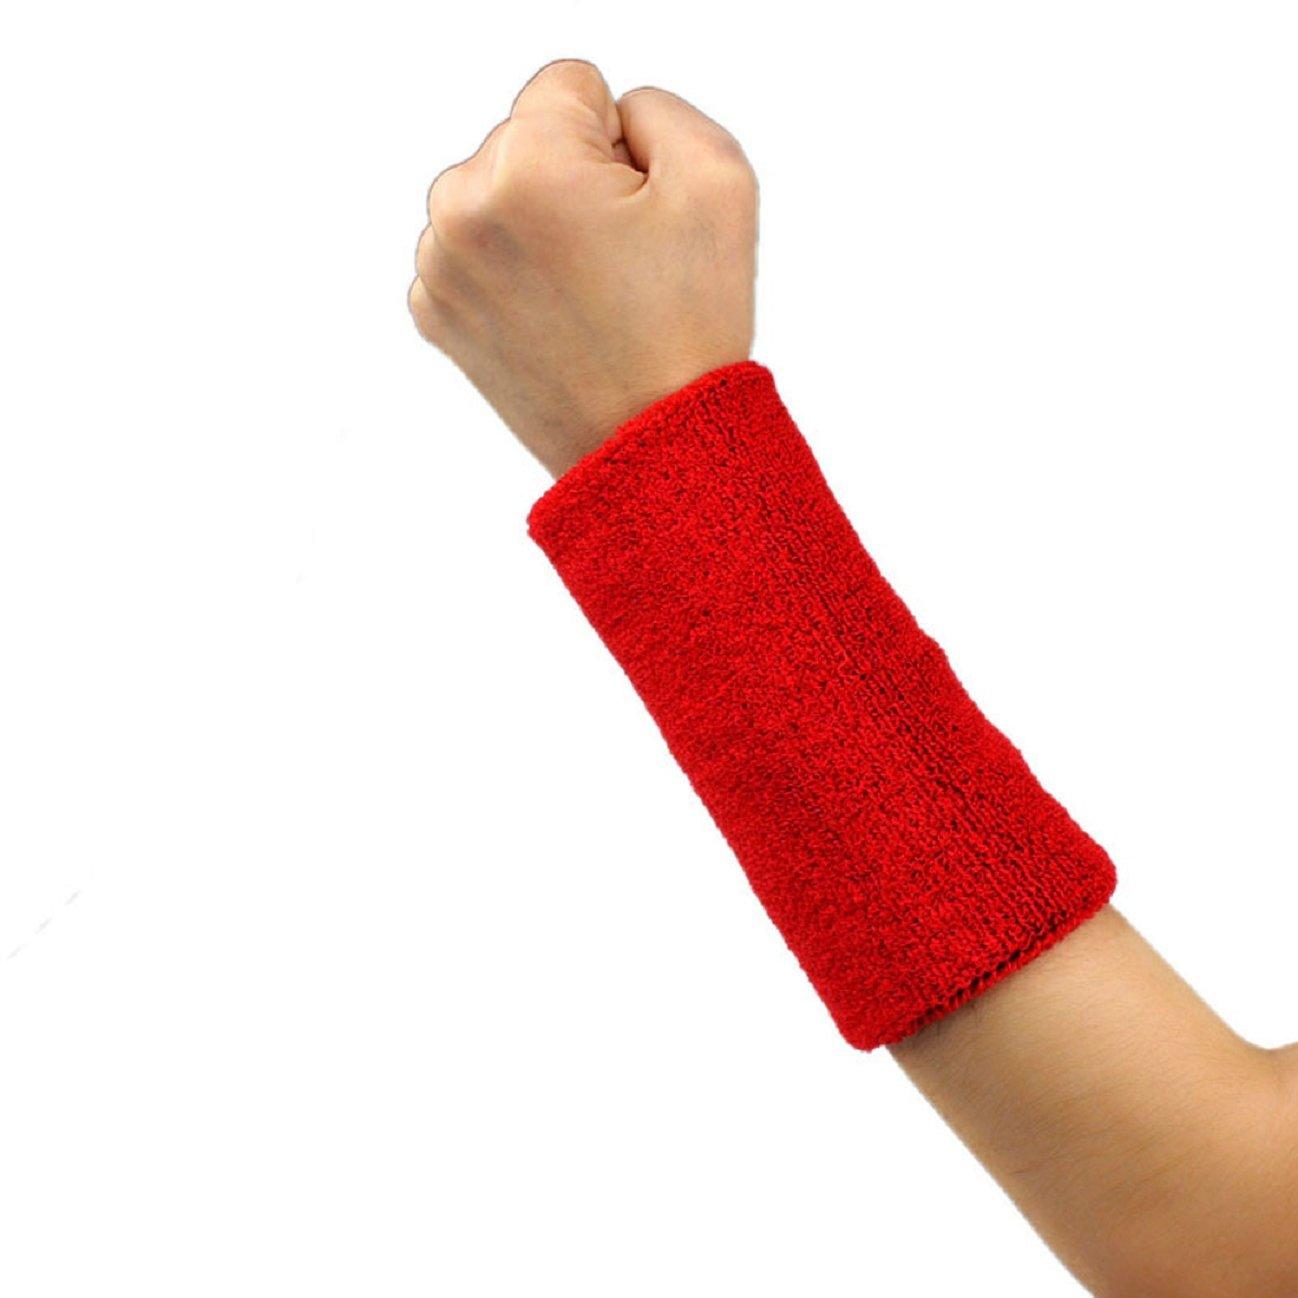 Tonsee 1 PCS Unisex Cotton Basketball Tennis Gym Yoga Sweatband Wristband (Red)